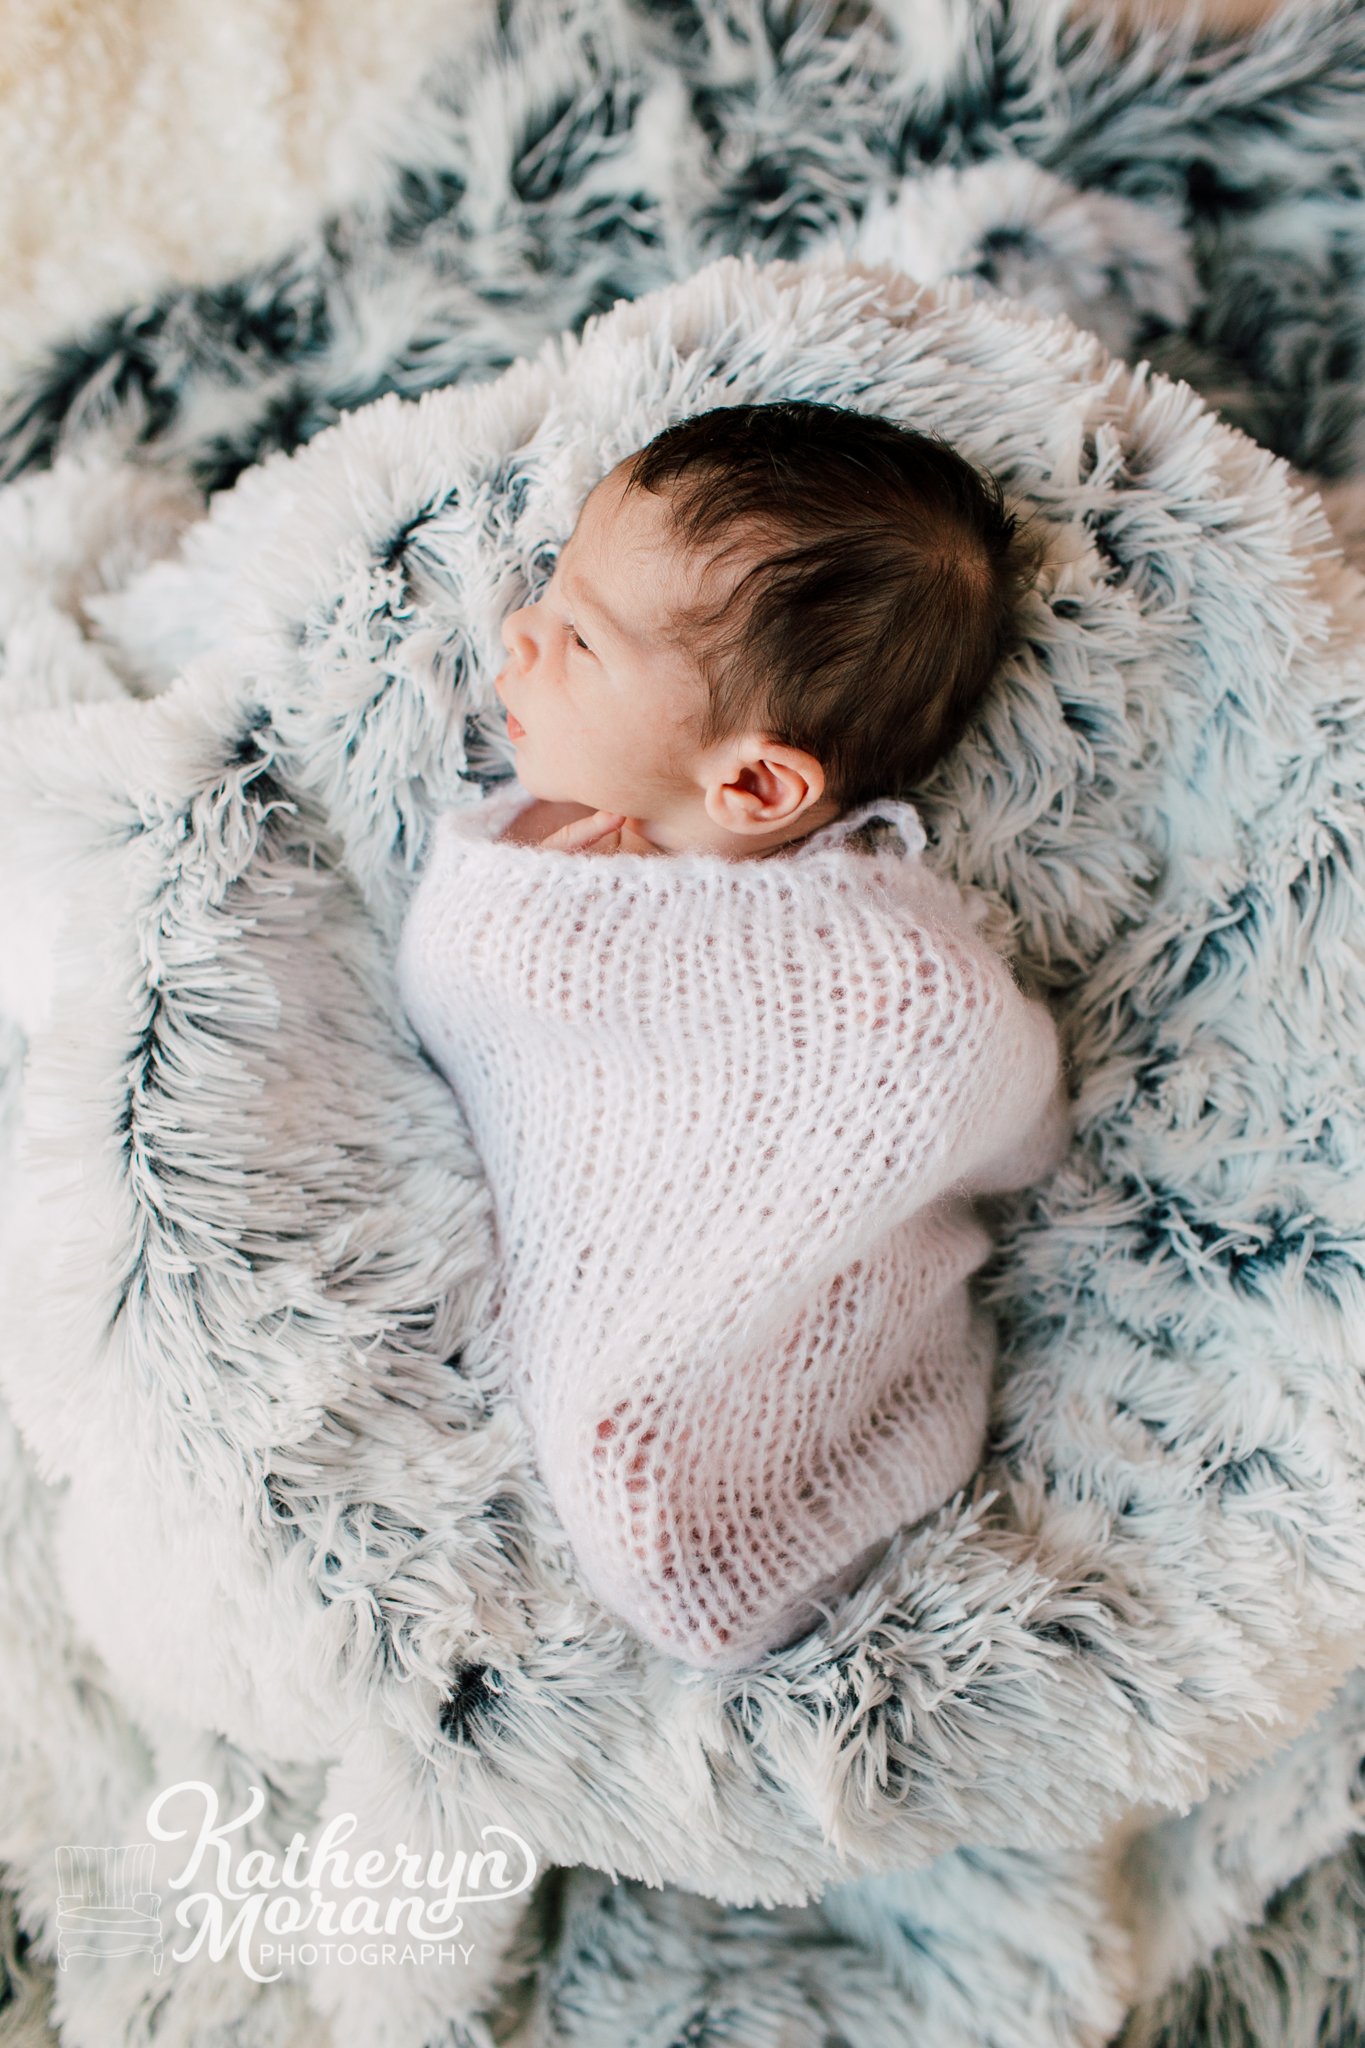 seattle-duvall-newborn-photographer-katheryn-moran-solorio-1.jpg